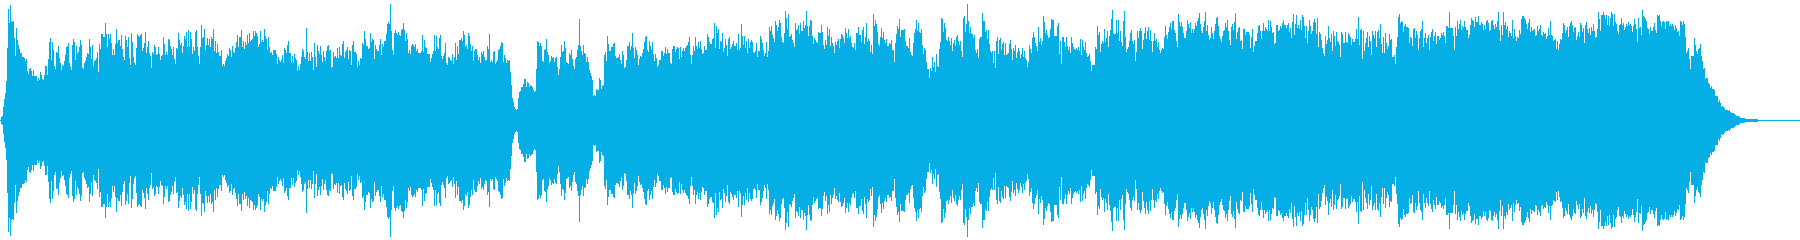 HOLLYWOOD OVERTUREの再生済みの波形